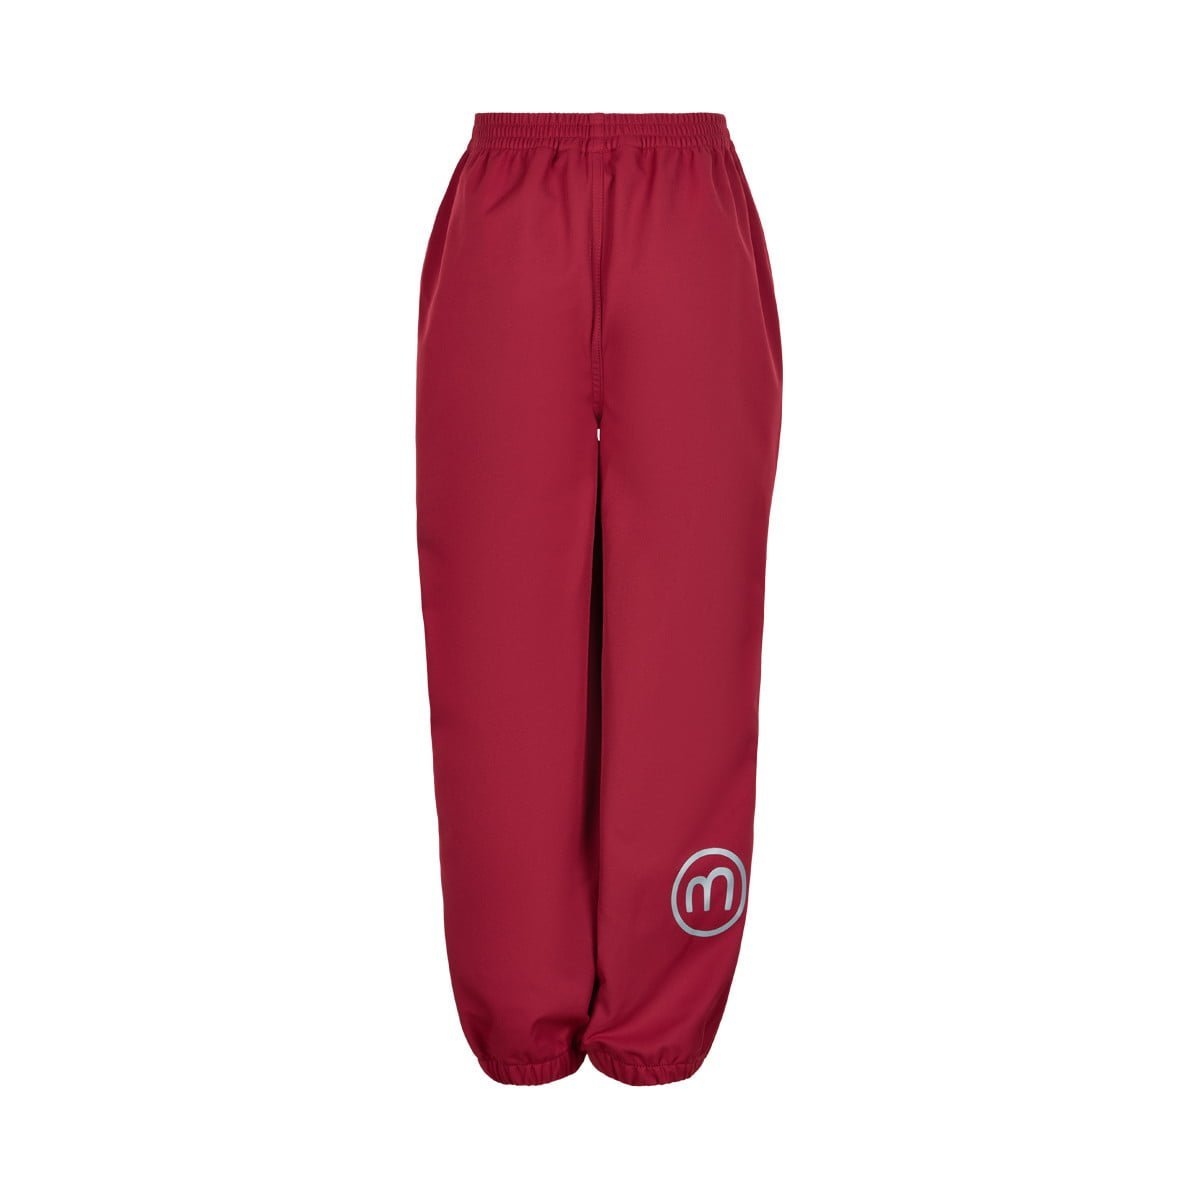 Pantaloni de ploaie și vânt (impermeabili) din softshell Deep Claret Minymo 2